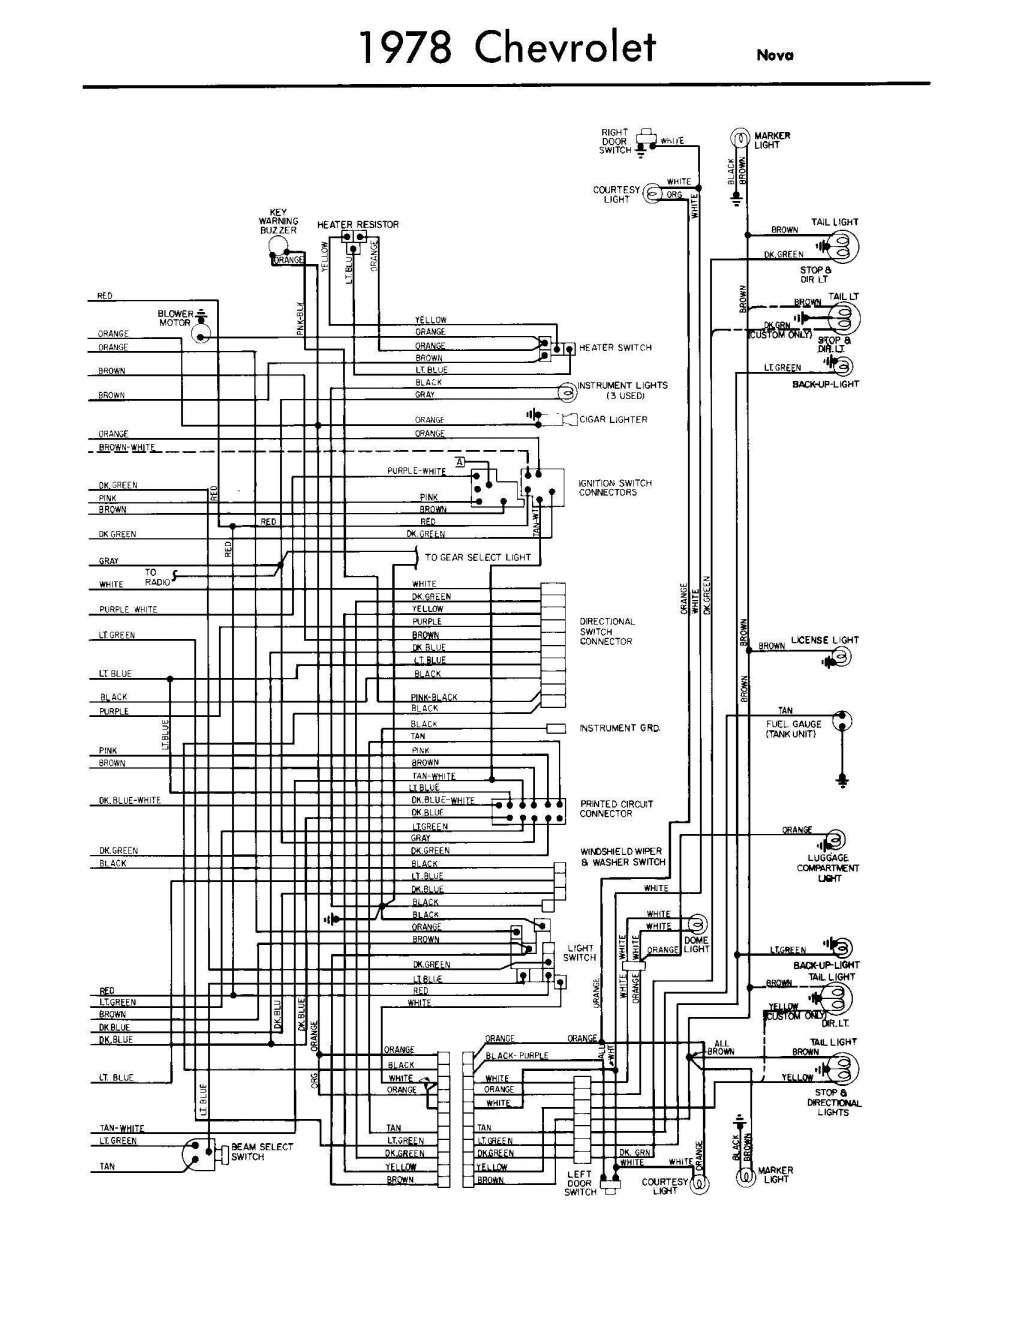 10 1974 Corvette Engine Wiring Diagram Engine Diagram Wiringg Net In 2020 Chevy Trucks Electrical Wiring Diagram Chevy